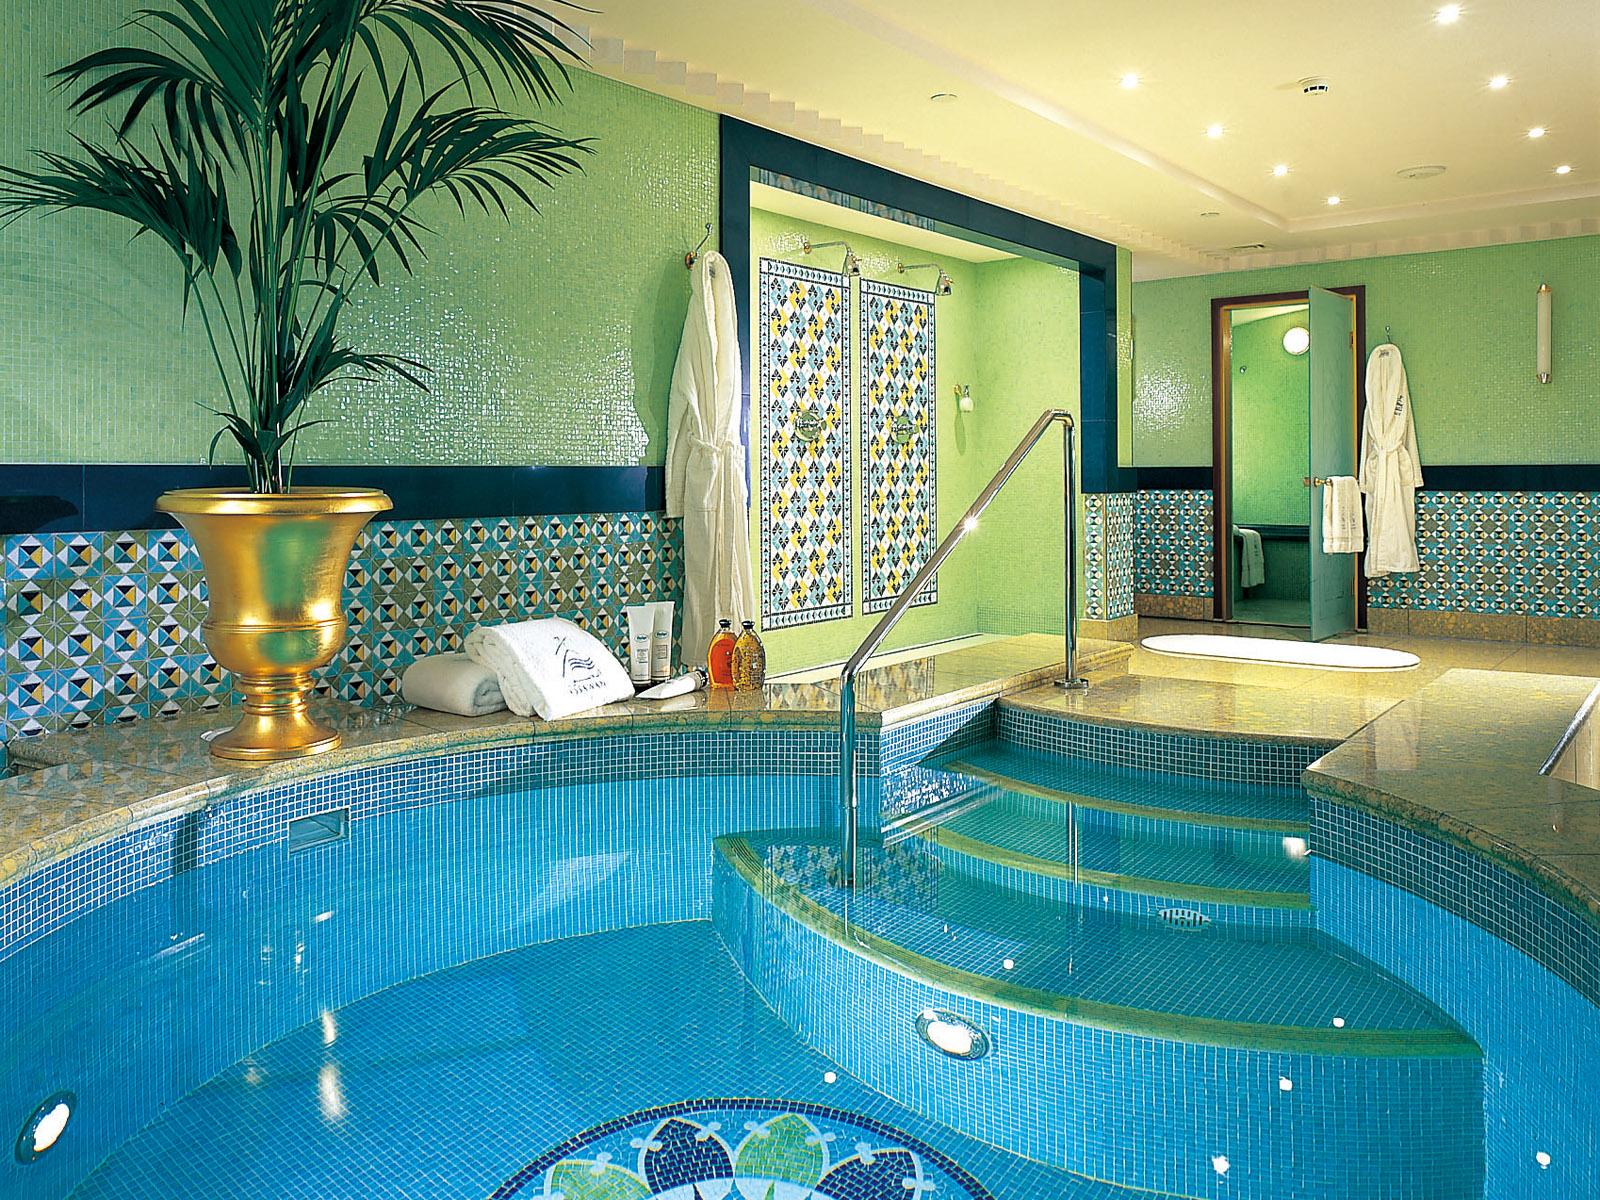 Luxury Life Design The World 39 S Only 7 Star Hotel Burj